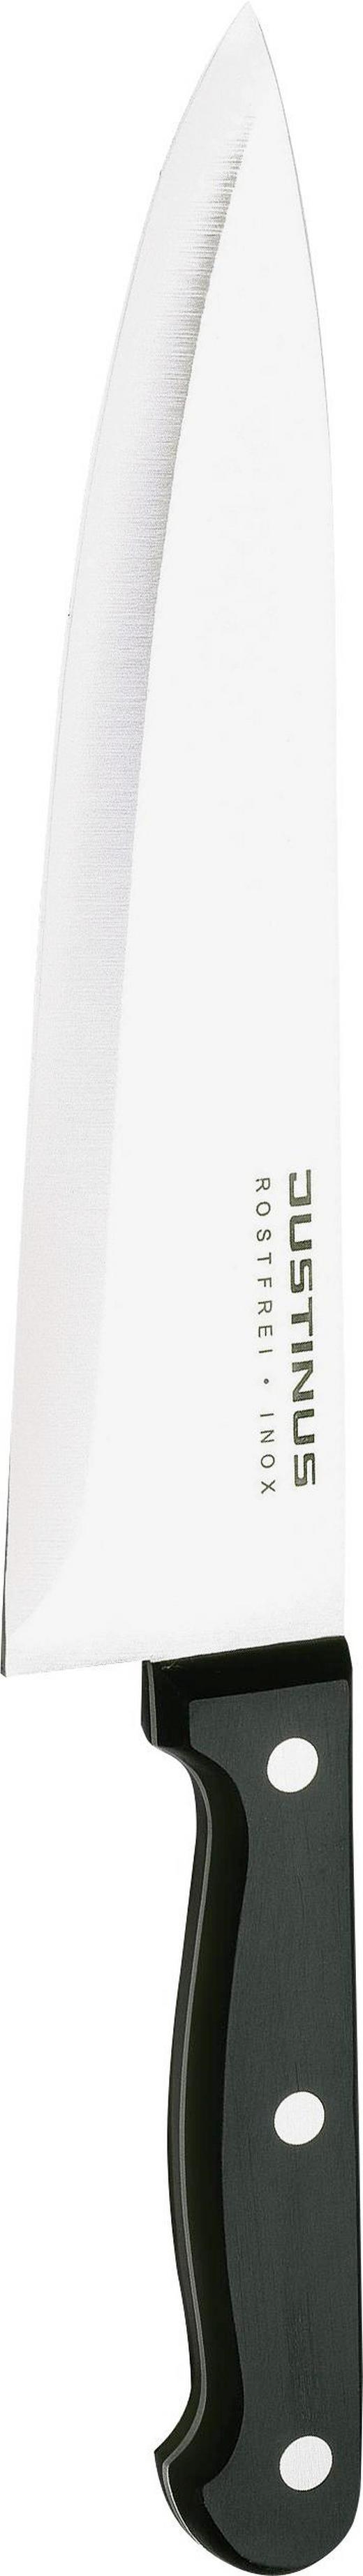 KUHINJSKI NOŽ 207-800, 21 CM - črna/srebrna, Konvencionalno, kovina/umetna masa (32cm) - JUSTINUS